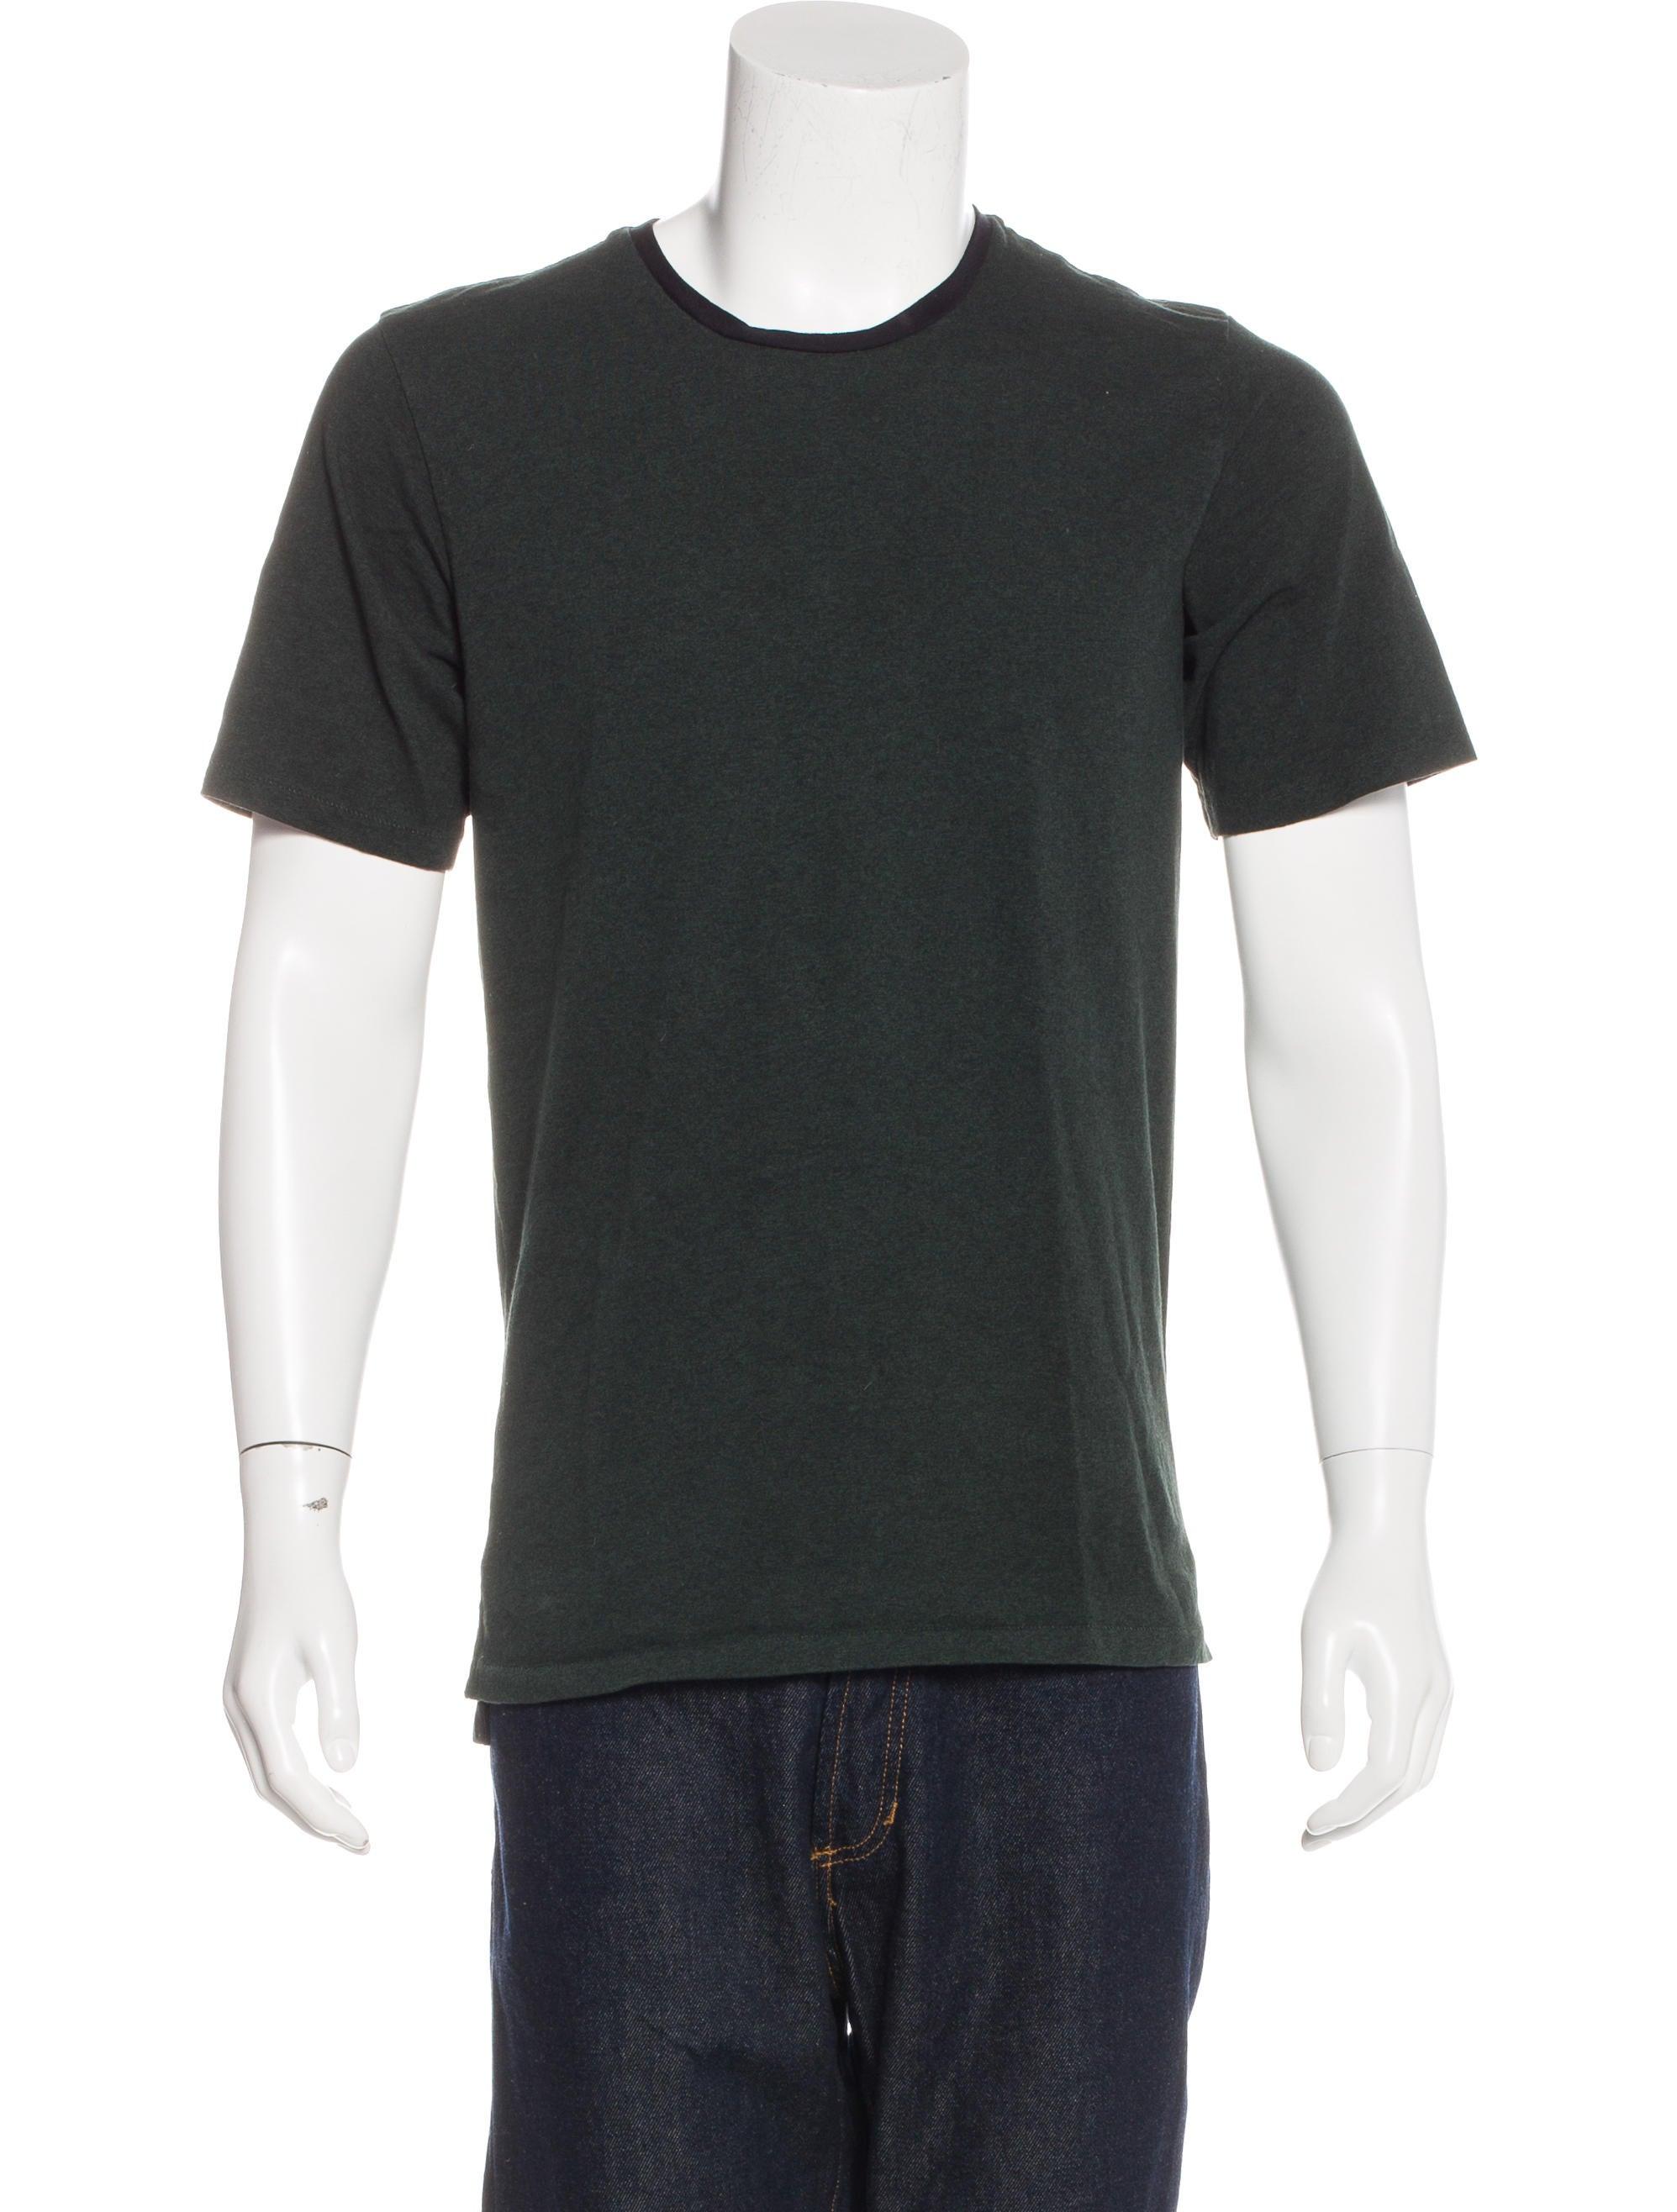 Rag bone crew neck t shirt clothing wragb69581 the for Rag and bone t shirts